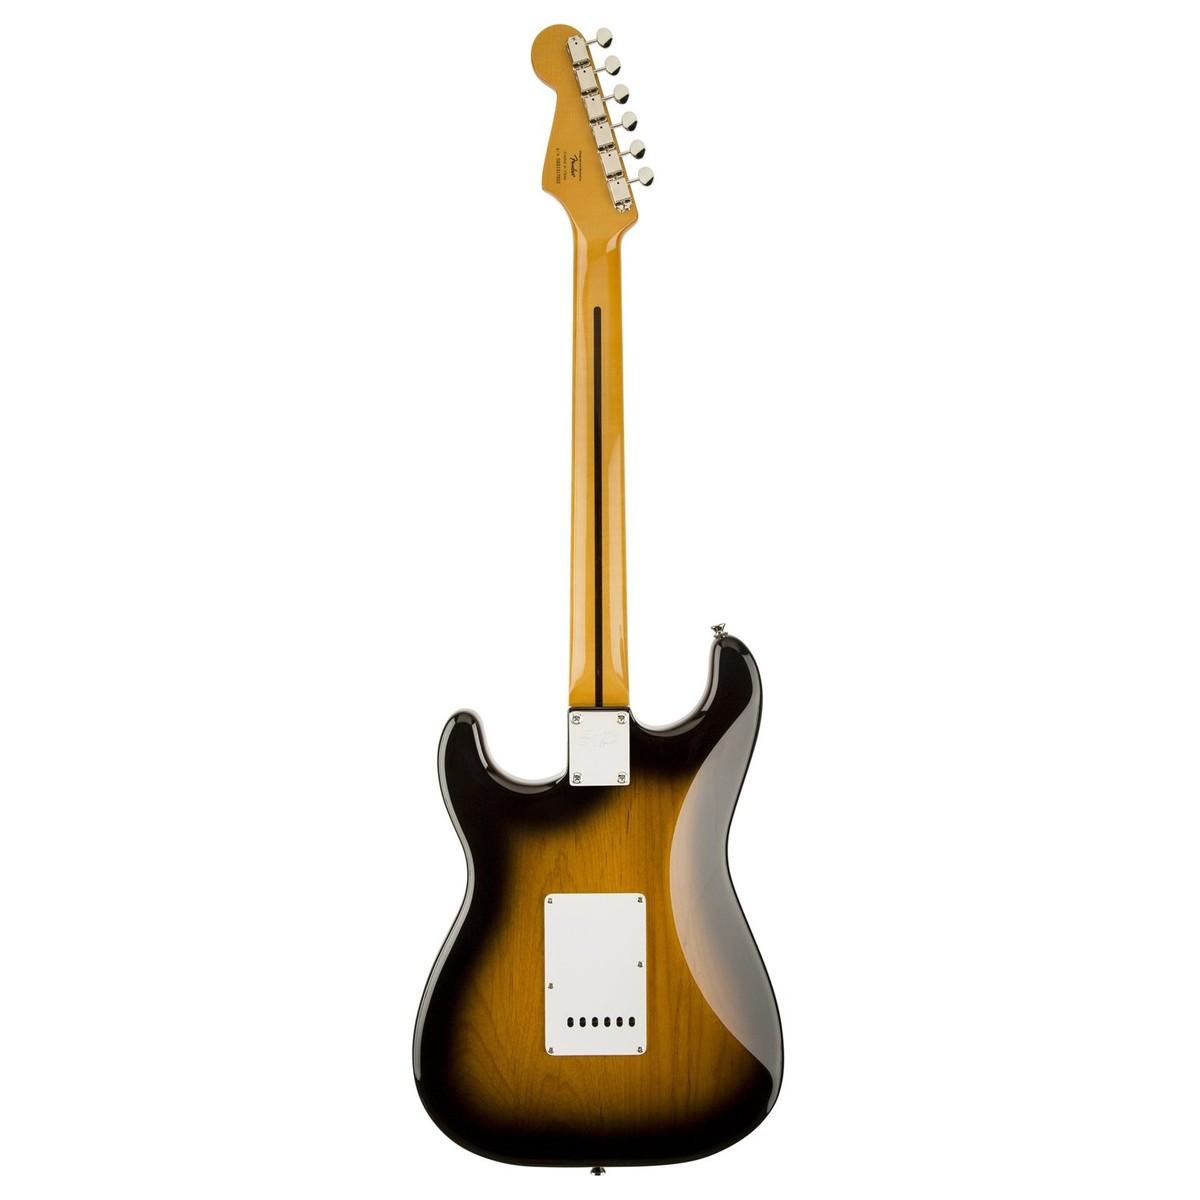 squier classic vibe 50s stratocaster 2 tone sunburst at gear4music. Black Bedroom Furniture Sets. Home Design Ideas